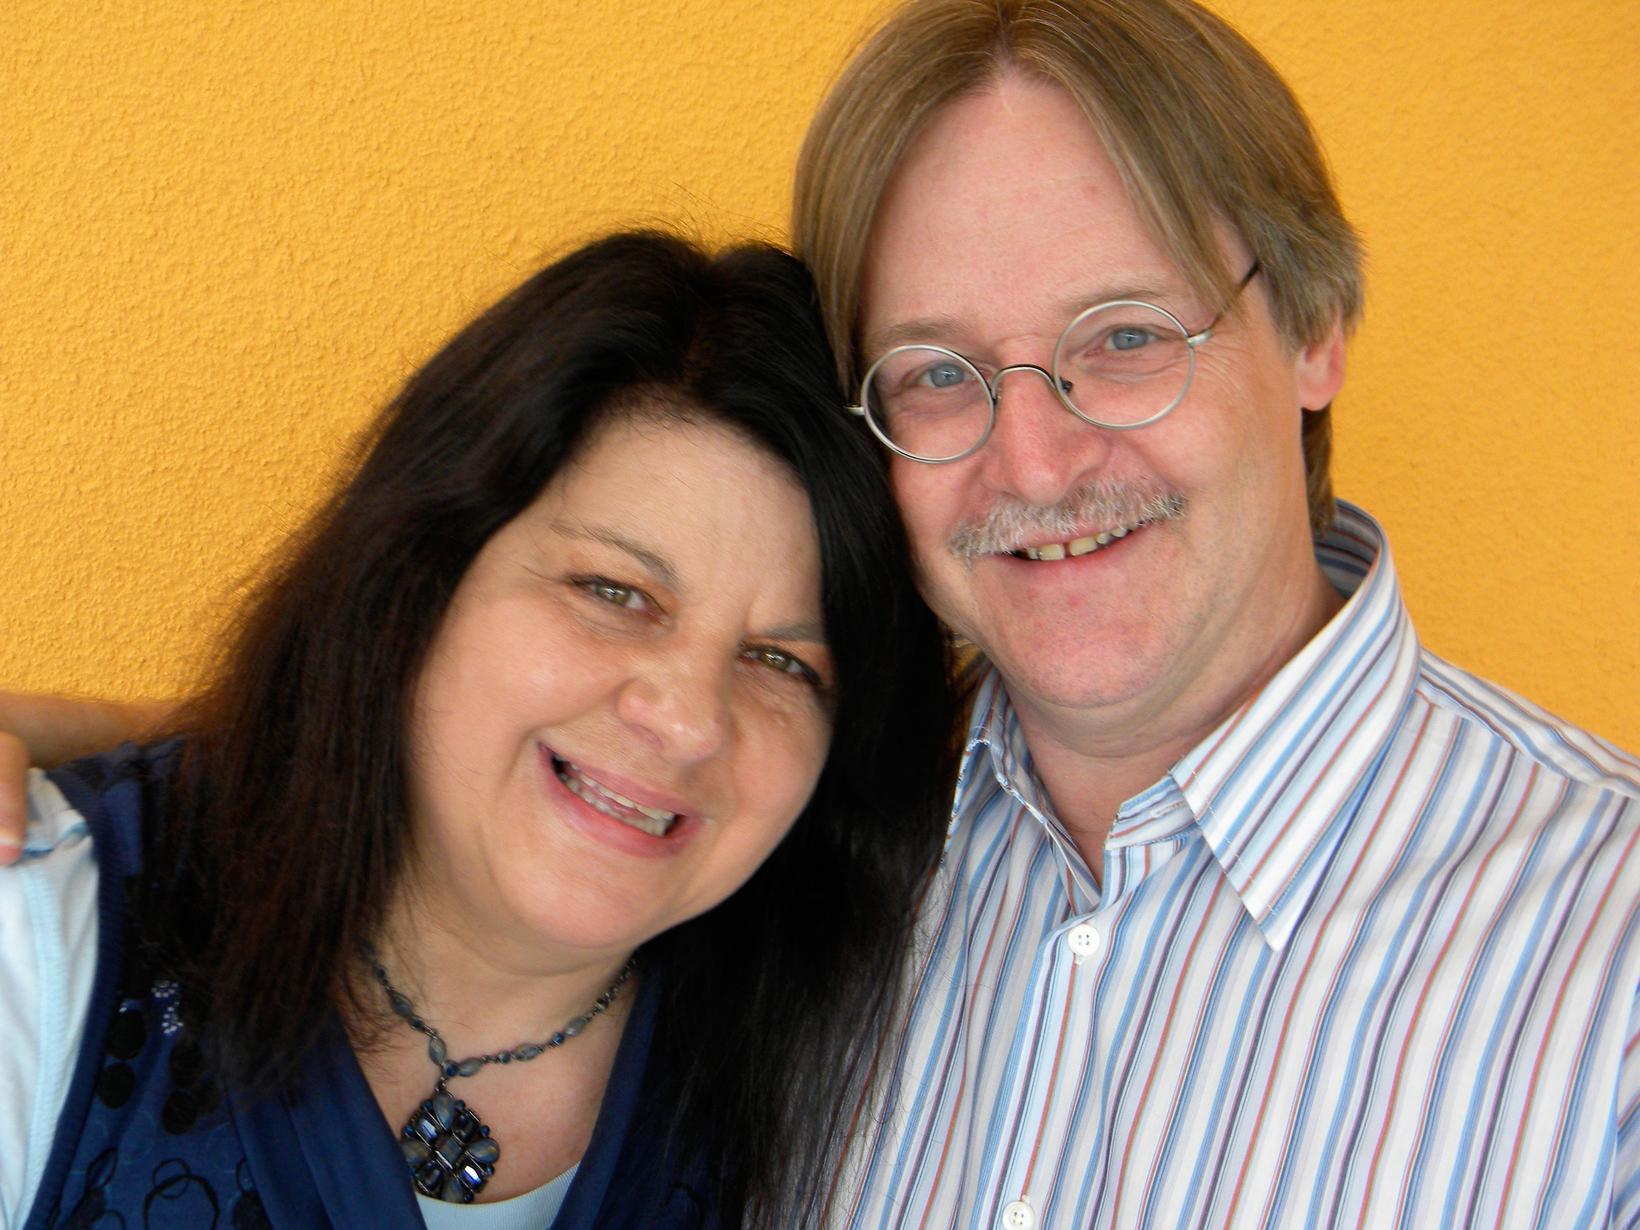 Michael & Hannelore from Lörrach, Germany